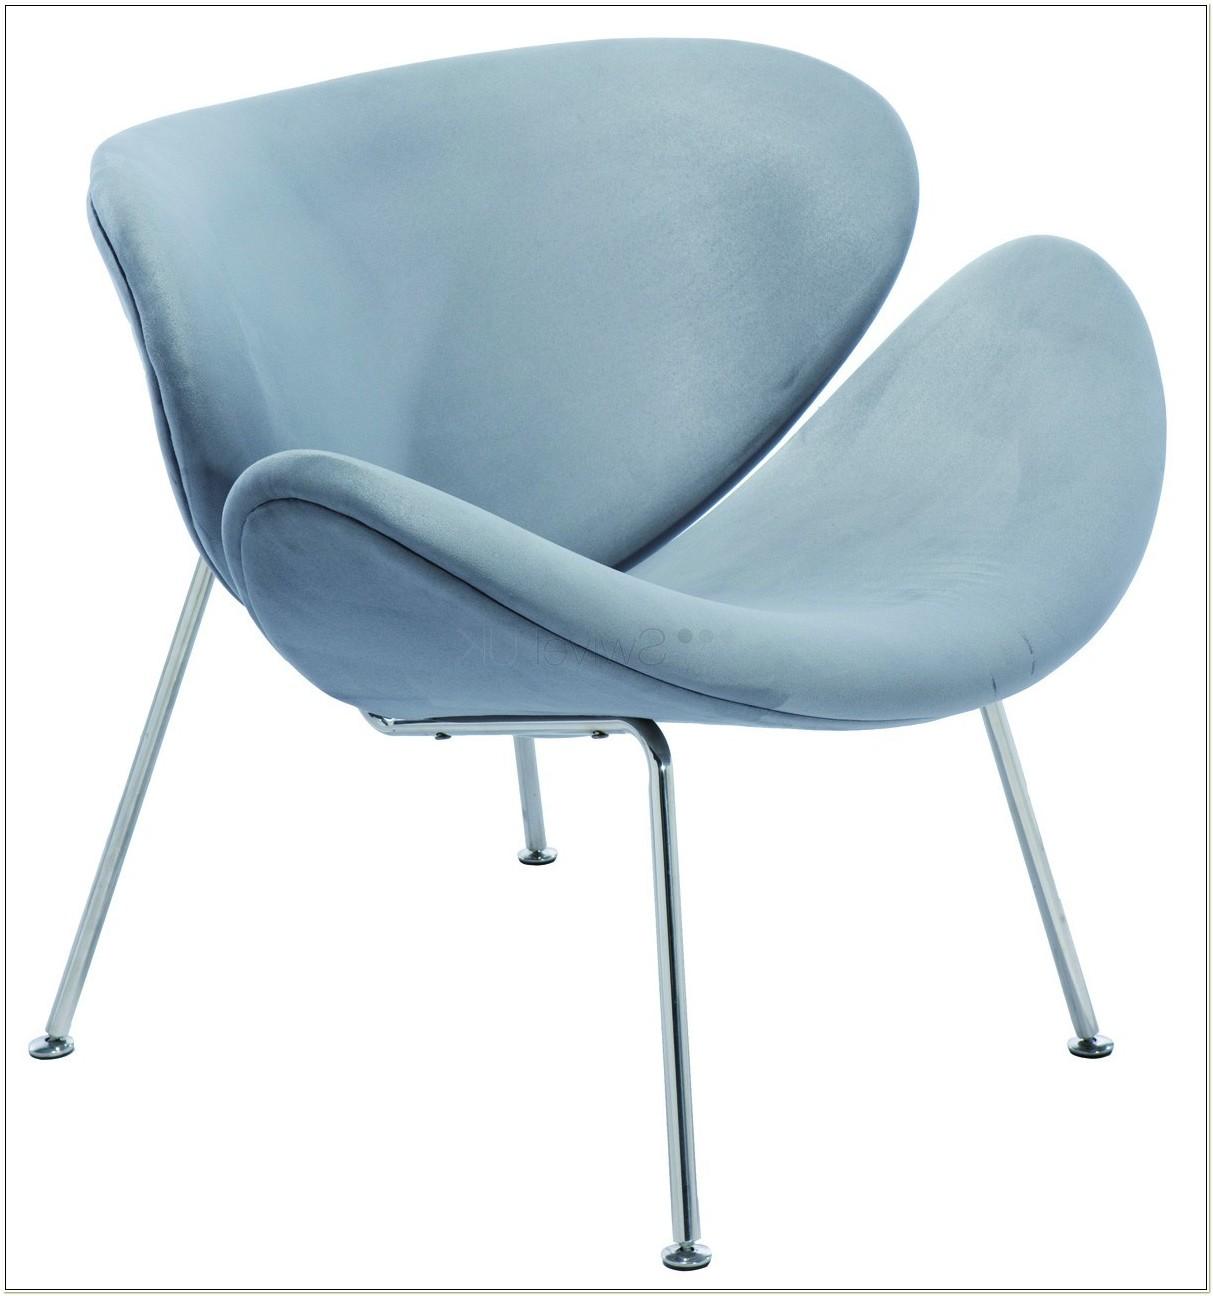 Orange Slice Chair Replica Uk